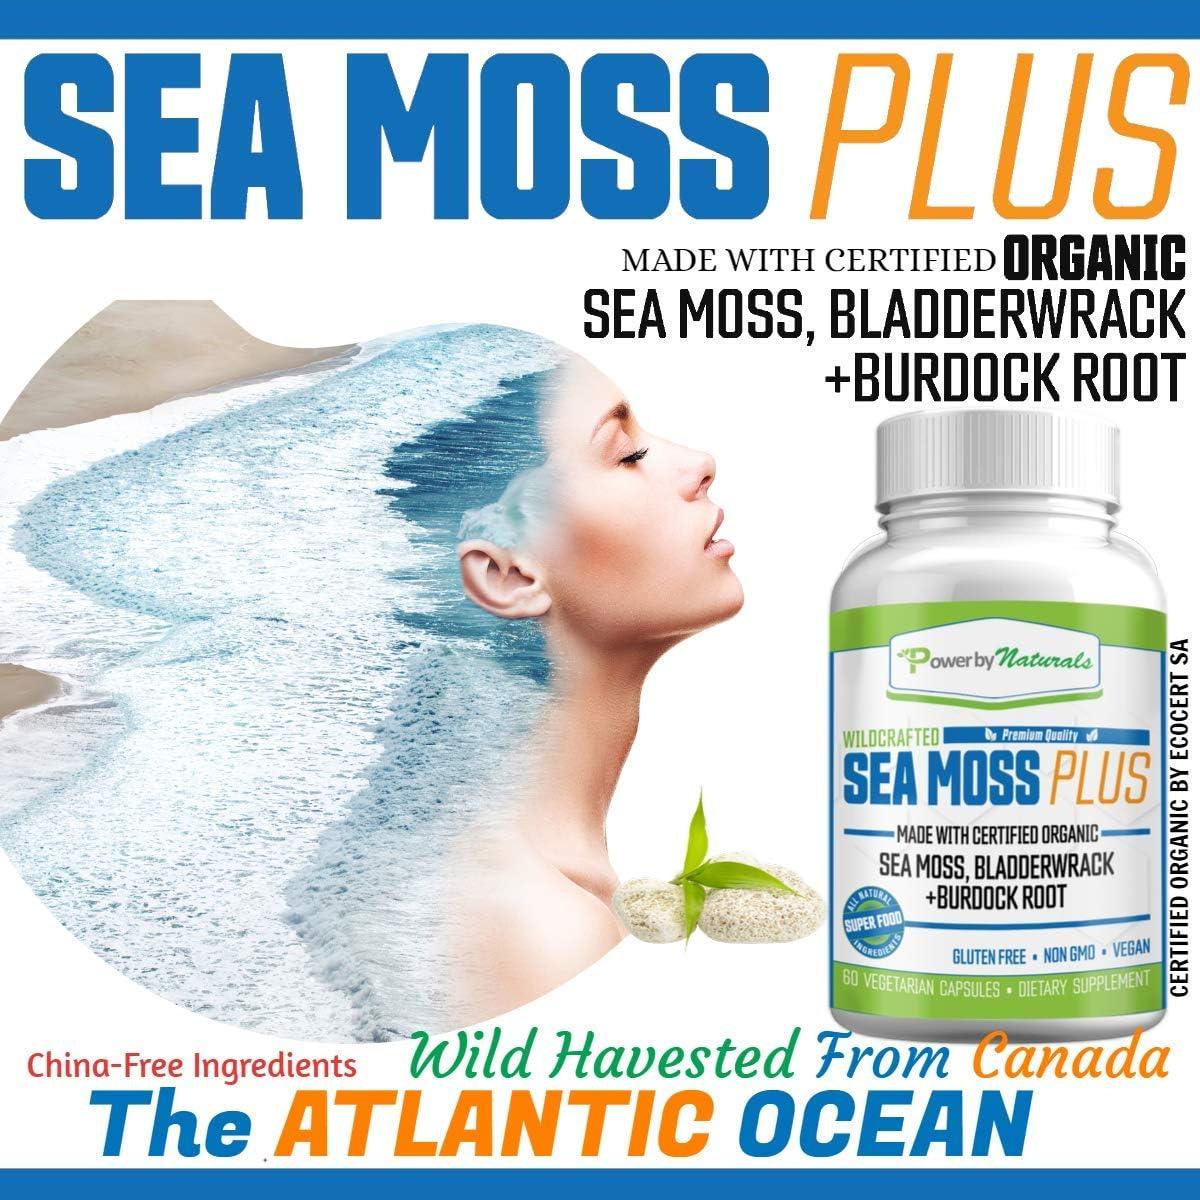 Power by Naturals – Certified Organic Sea Moss Plus – Wildcrafted Irish Sea Moss Bladderwrack Burdock Root – Pure Sea Moss Powder Supplements - No Fillers, Vegan, non-gmo - Seamoss Capsules (60 Pills): Health & Personal Care